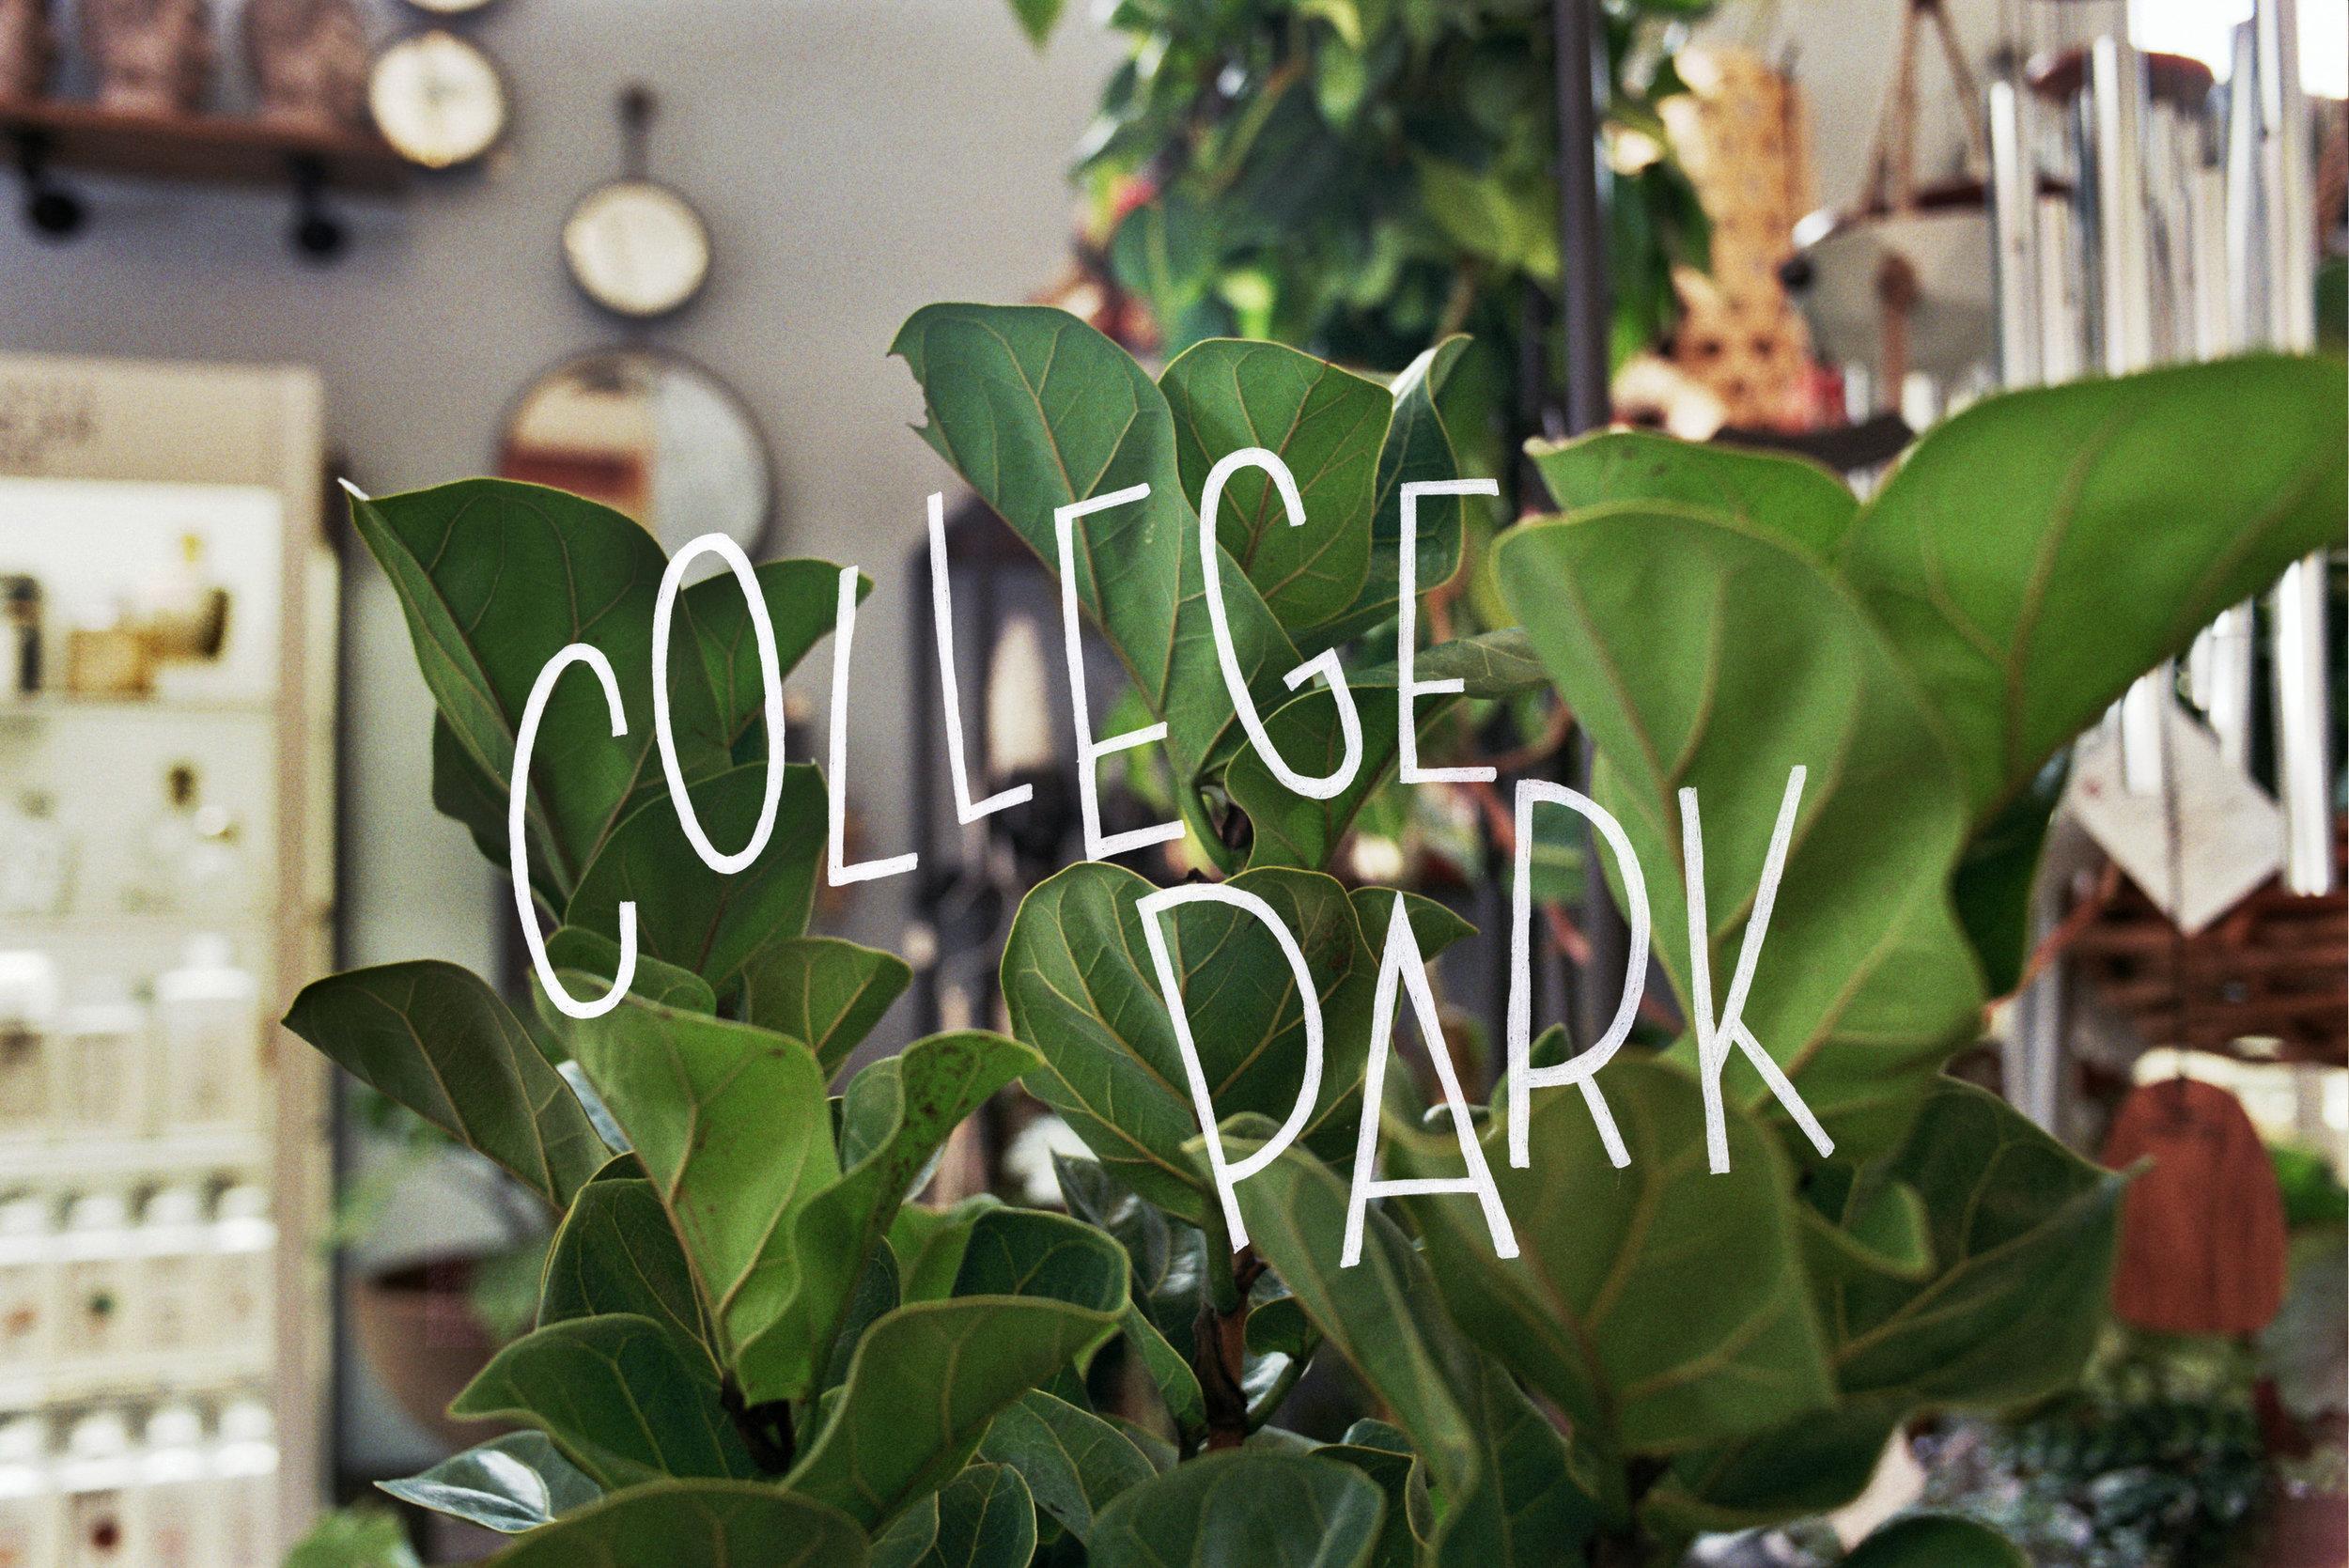 collegetitle1.JPG